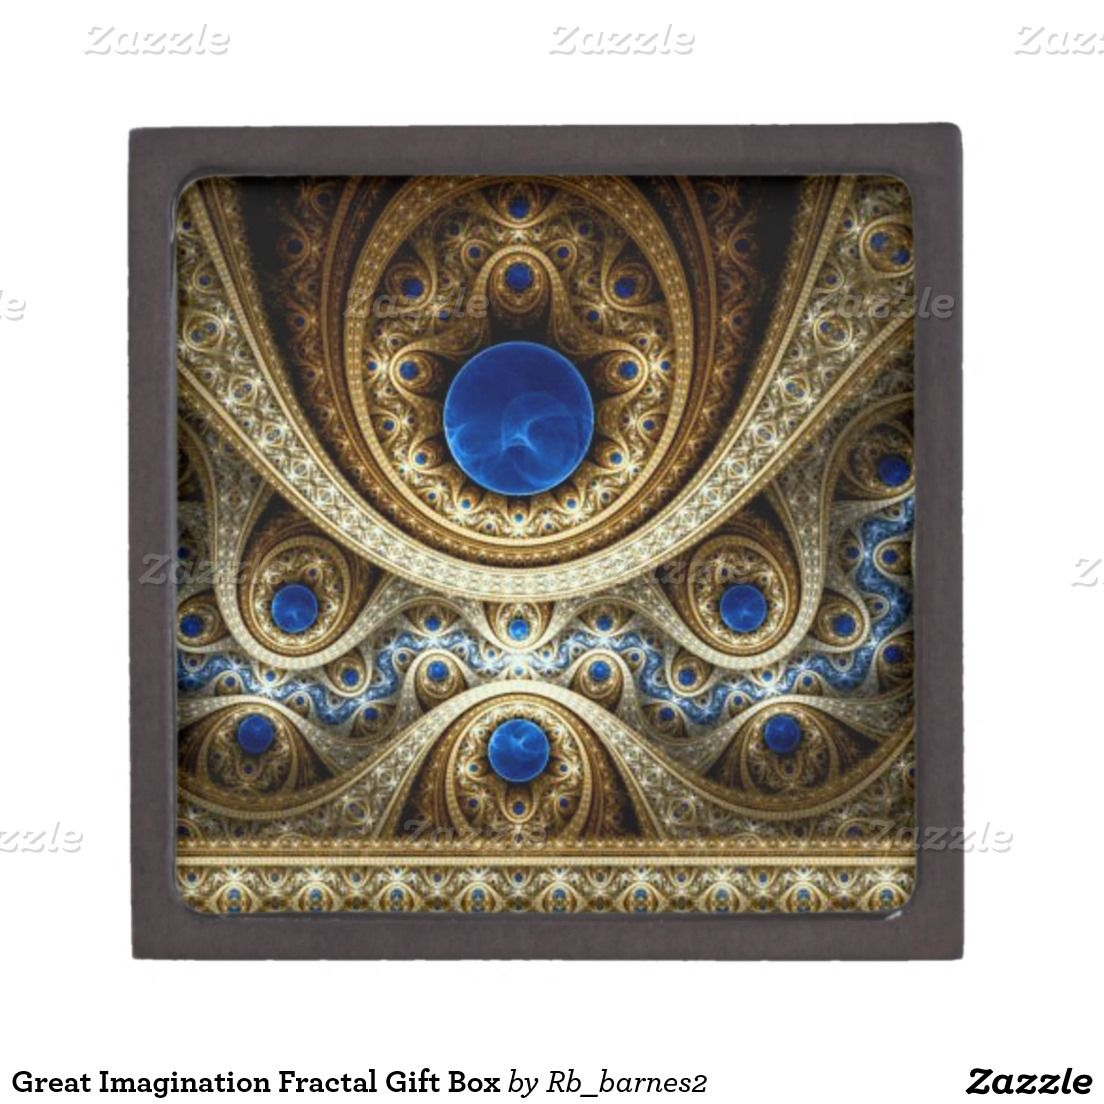 Great Imagination Fractal Gift Box Premium Keepsake Boxes